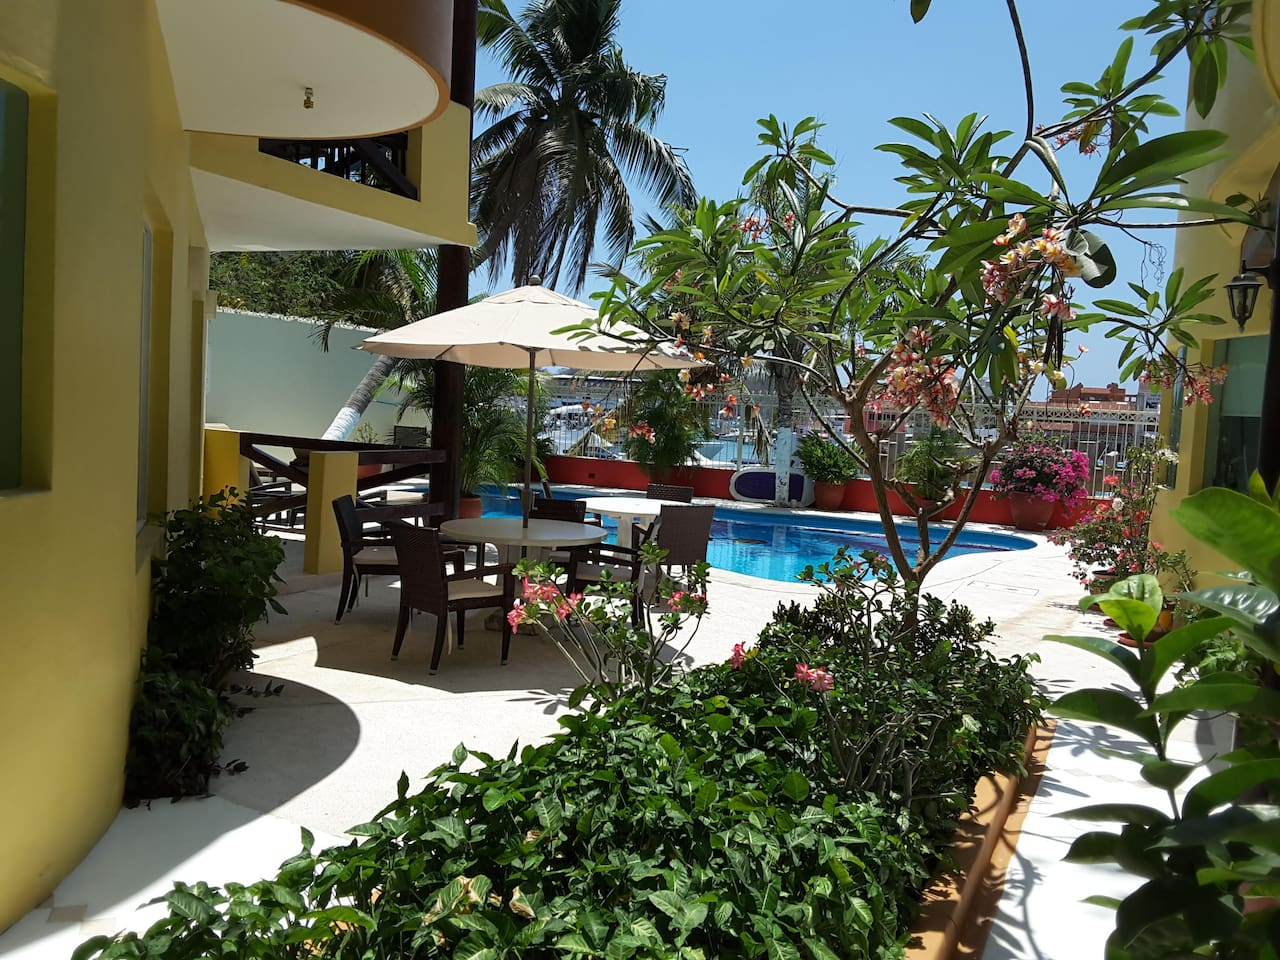 Pool, garden and Sta. Cruz Marina view at Real Marina Blue Condo / 2, 3-level complex w 14 apts / Very quiet area